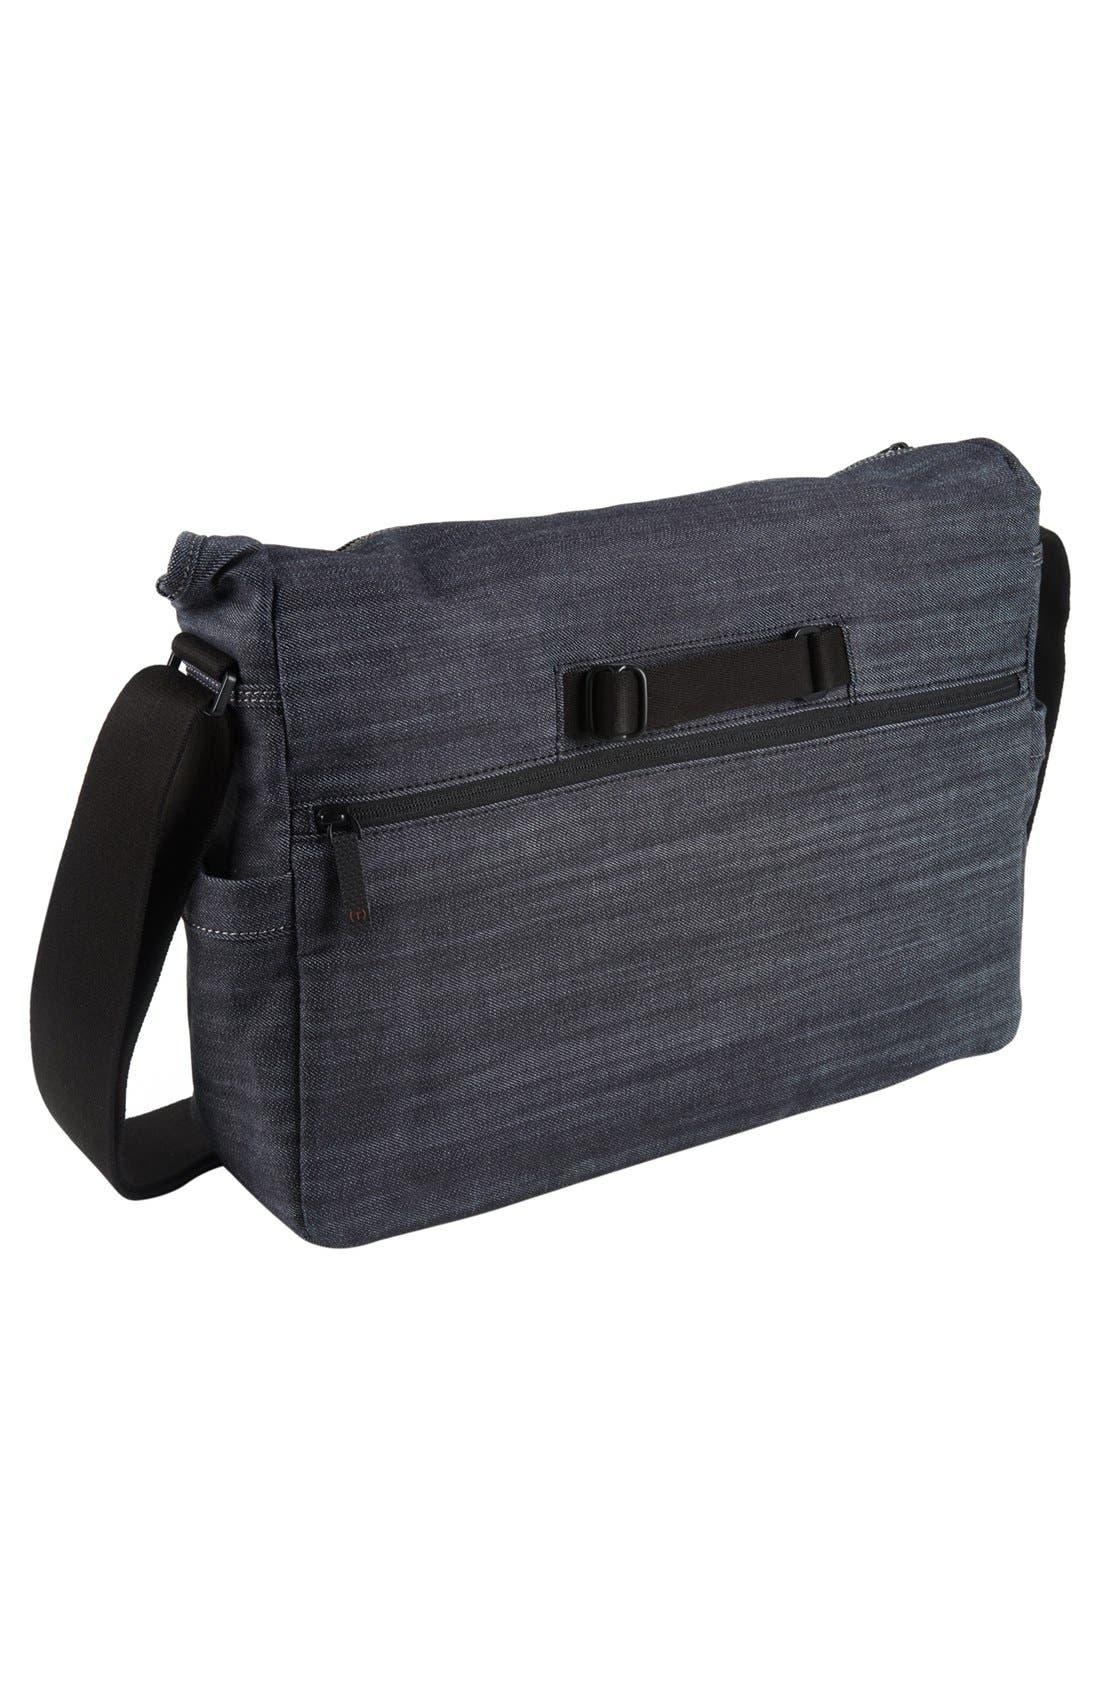 Alternate Image 2  - T-Tech by Tumi 'Icon - Usher' Messenger Bag